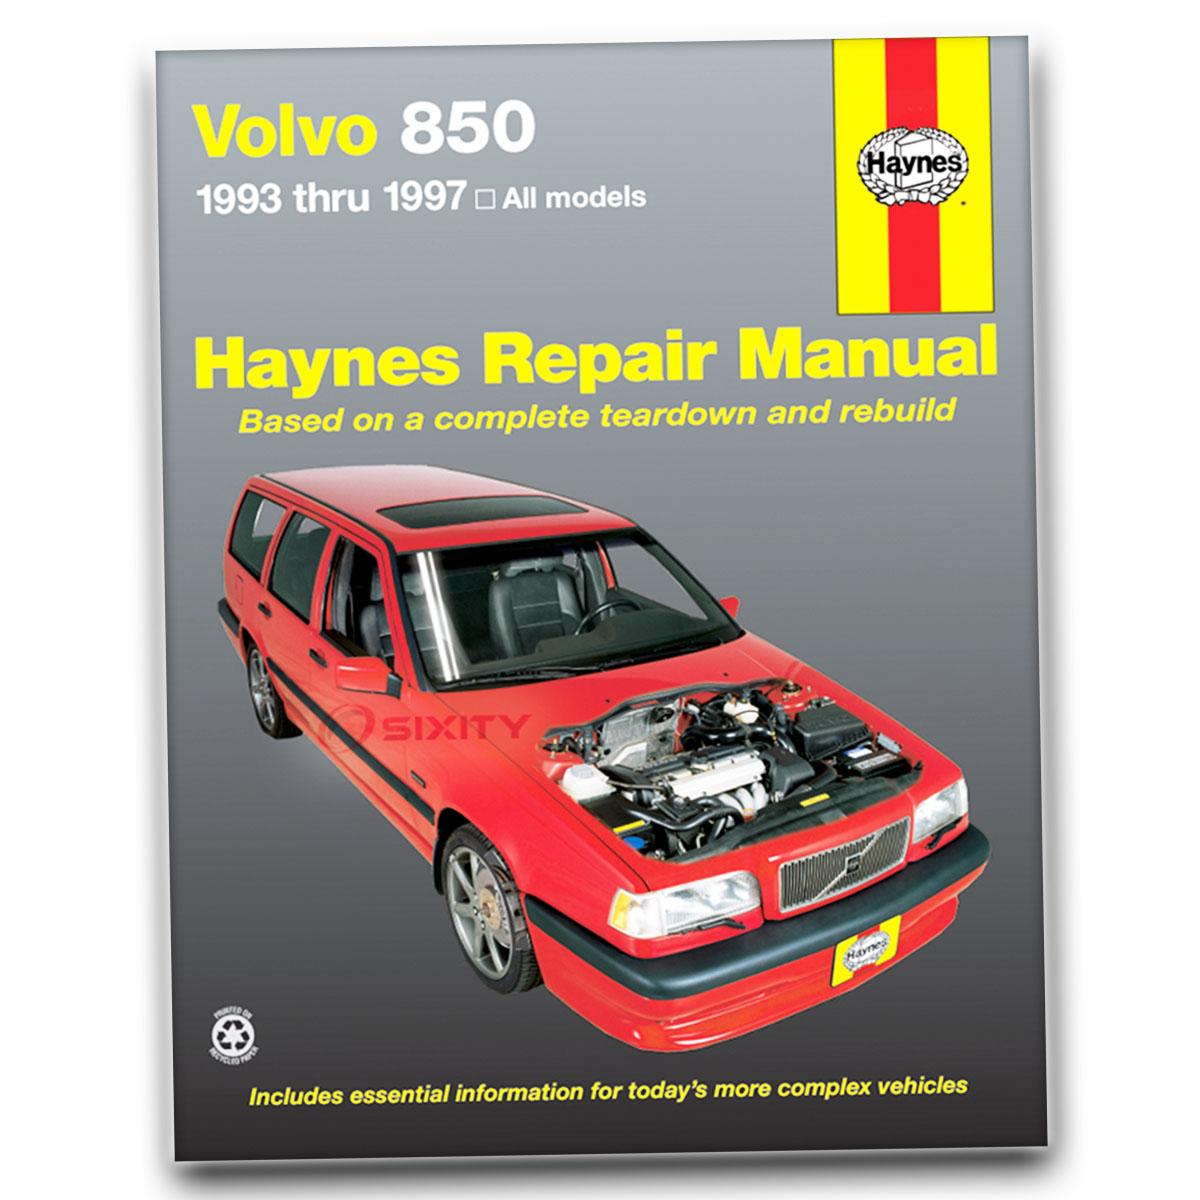 Haynes Repair Manual 97050 for Volvo 850 Series 93-97 Shop Service Garage ja